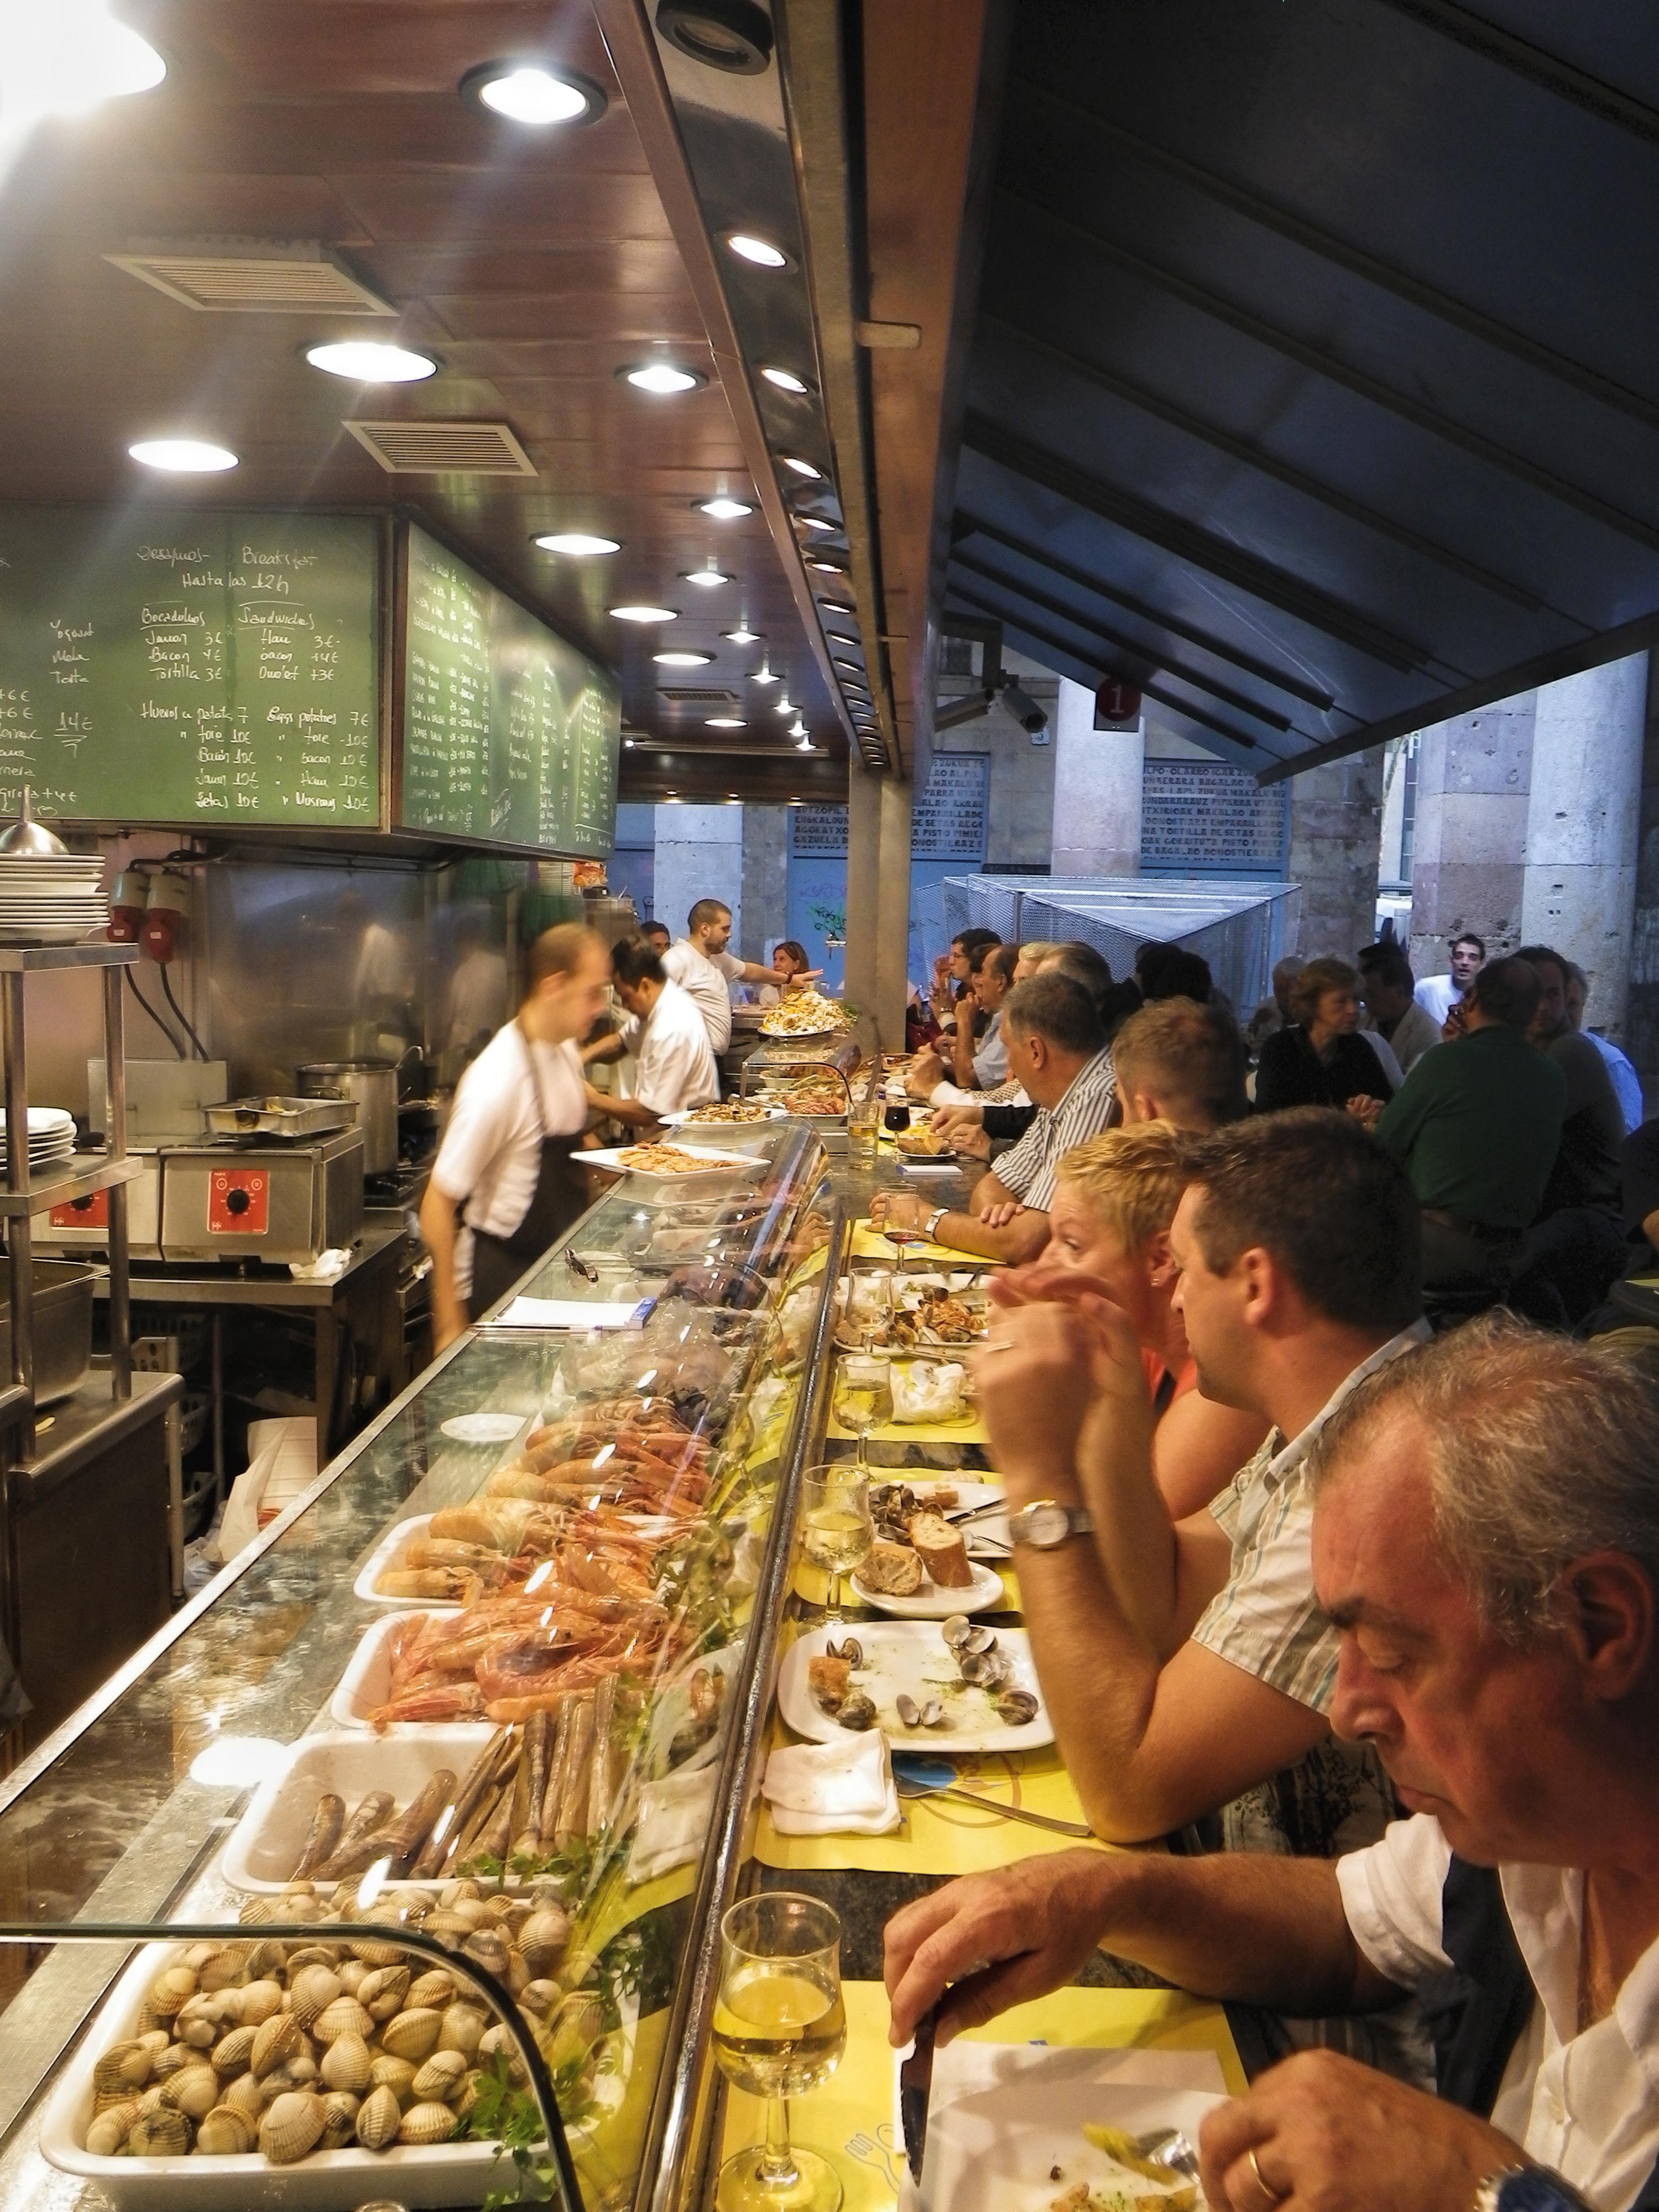 Barcelona, Spain - September 21, 2010: People having lunch in a restaurant in Marcedo de la Boqueria